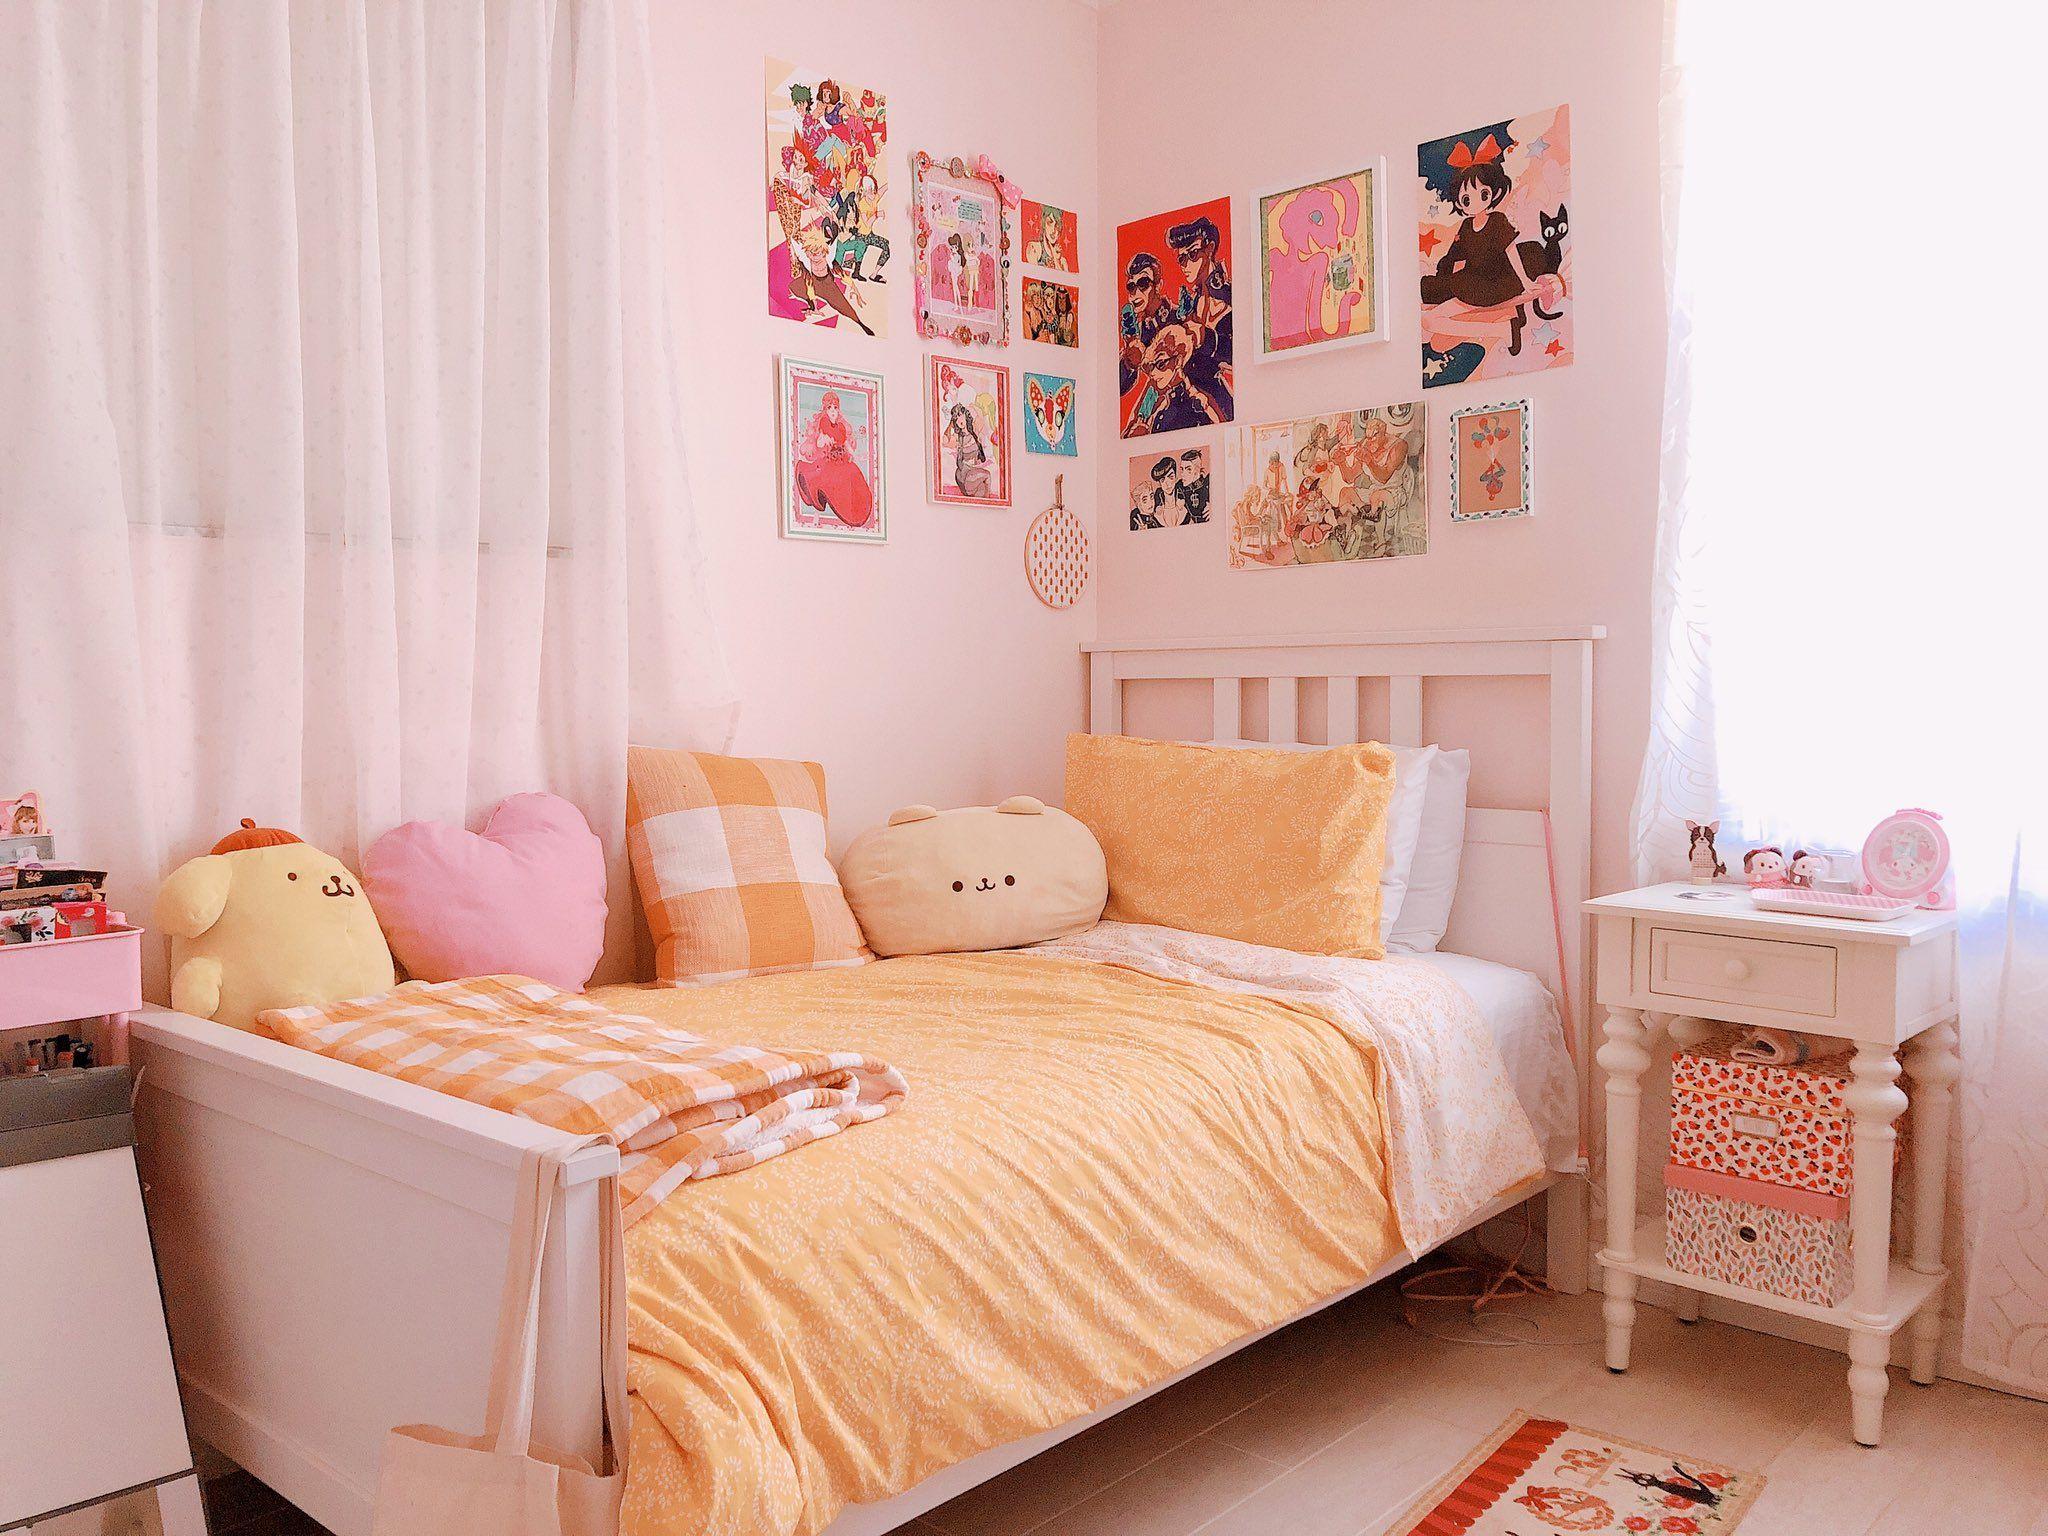 Peach On Twitter Army Room Decor Room Inspiration Bedroom Minimalist Room Pink minimalist room decoration